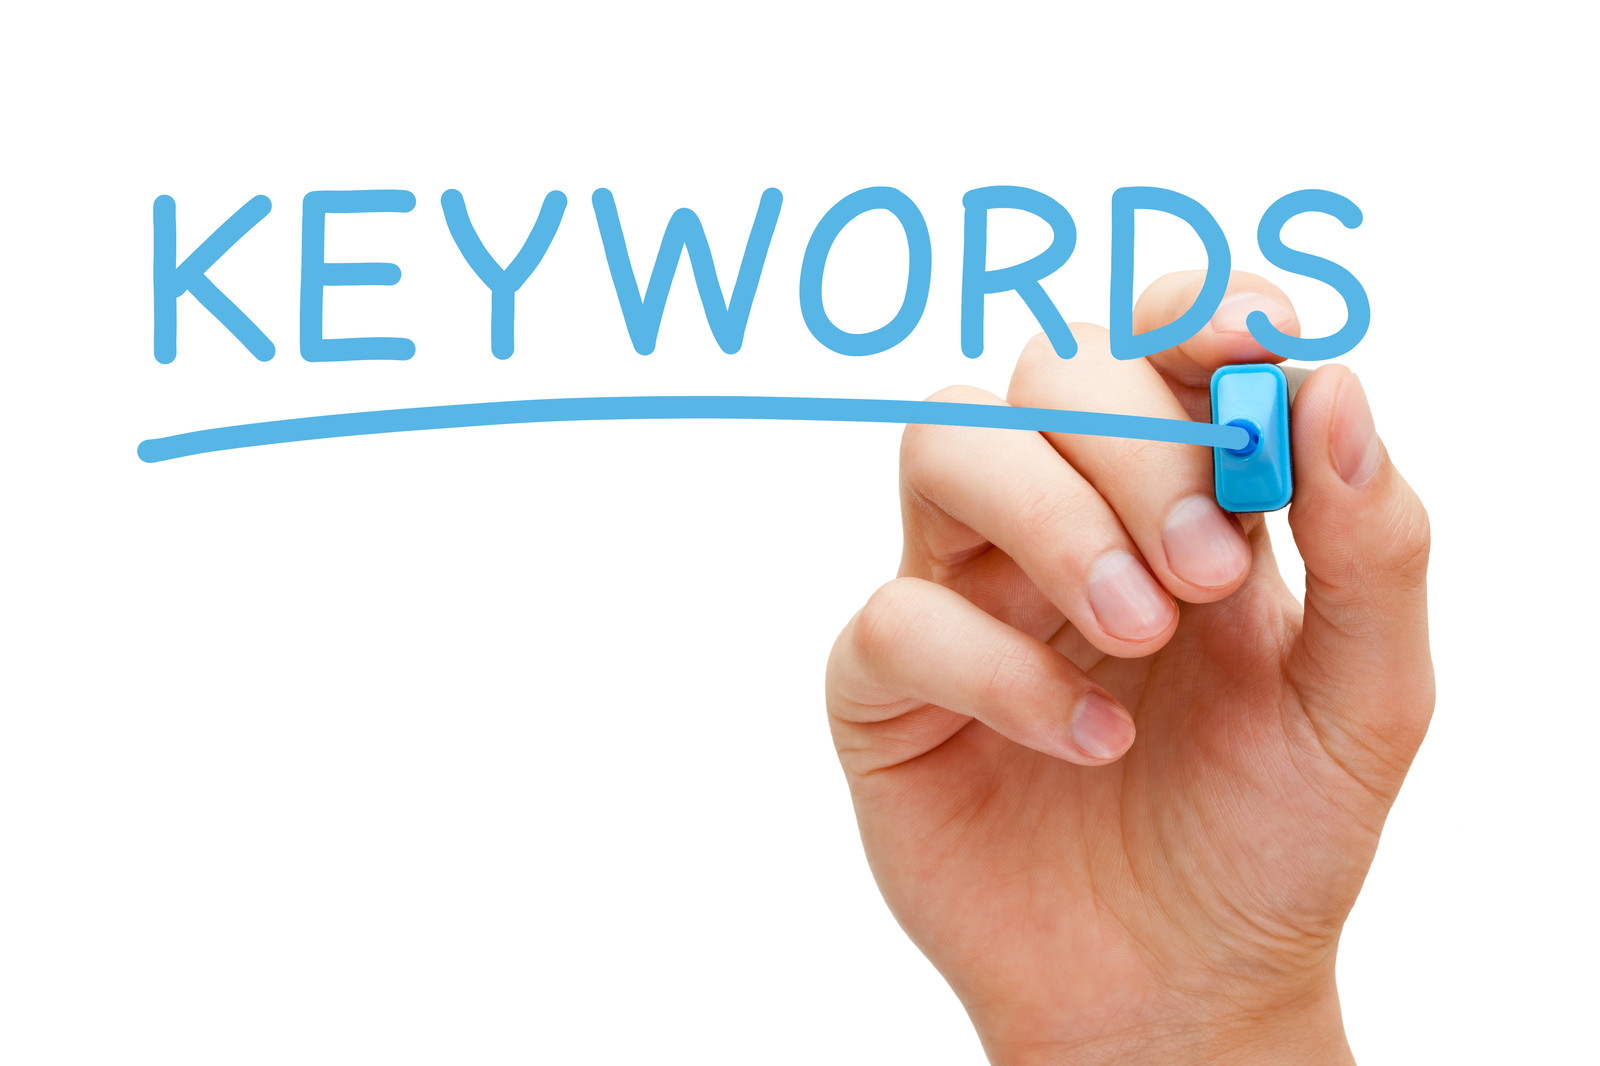 Anahtar Kelime Nasıl Seçilmeli?